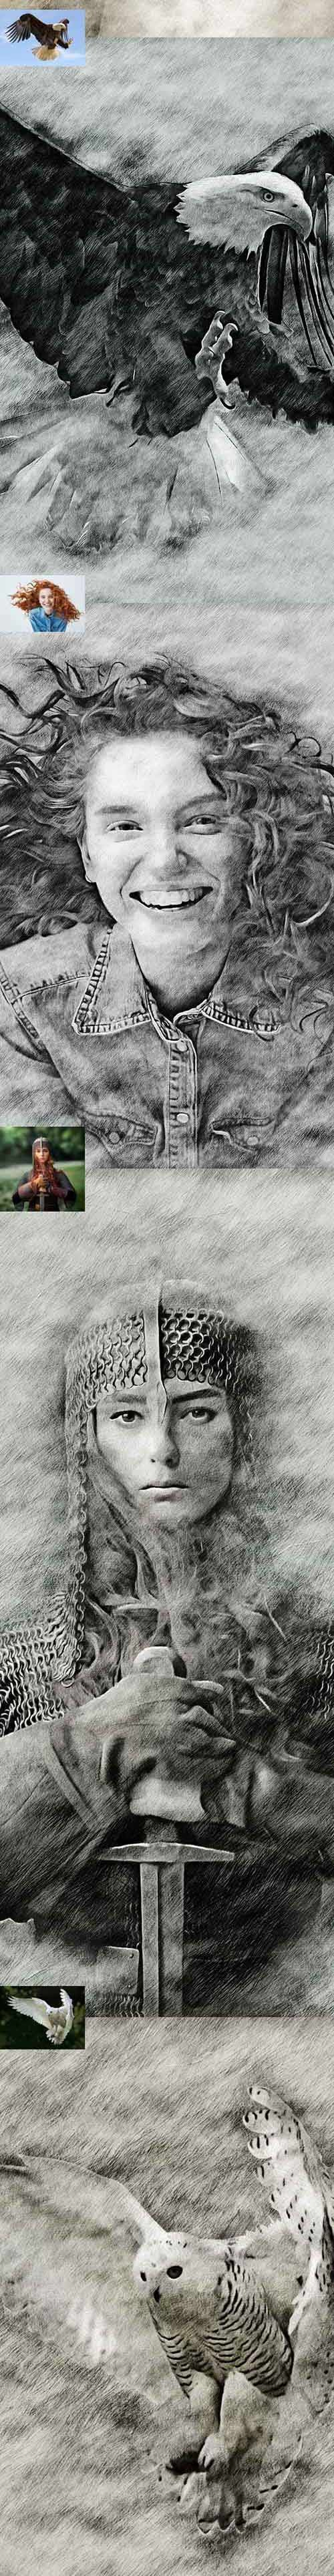 Graphicriver - Light Sketch CS4+ Photoshop Action 22100434